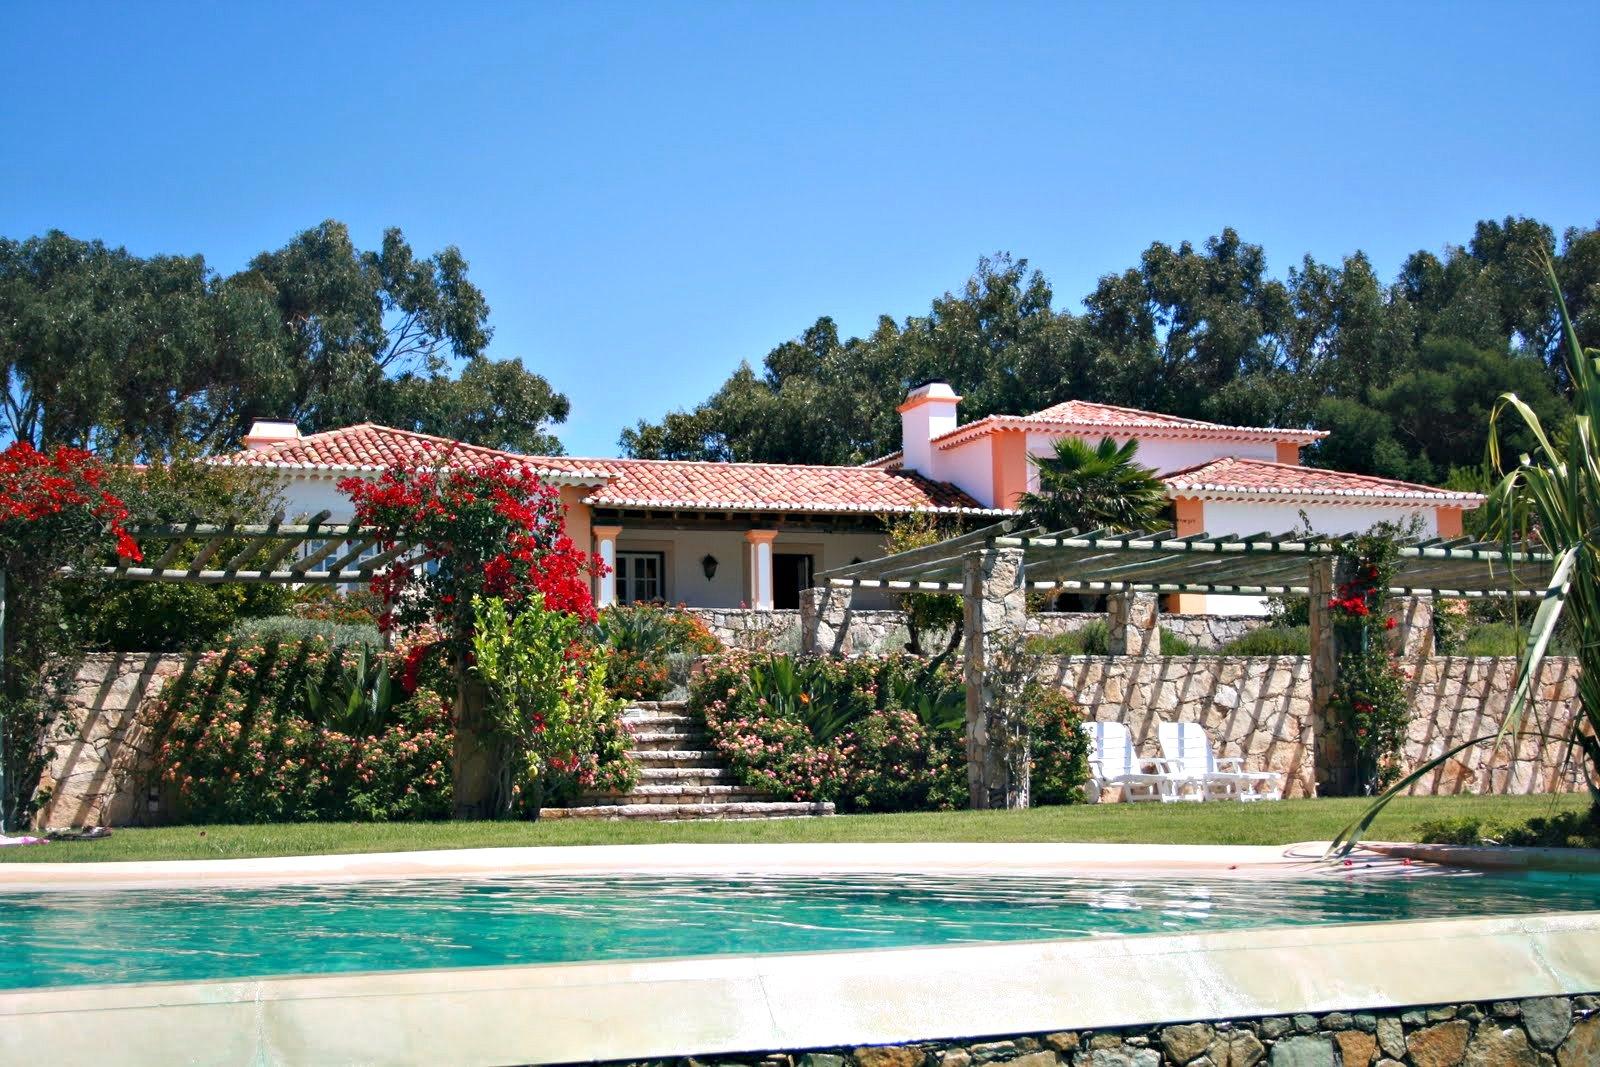 Private Villas In Portugal sol-domus bespoke villa rentals in portugal and beyond